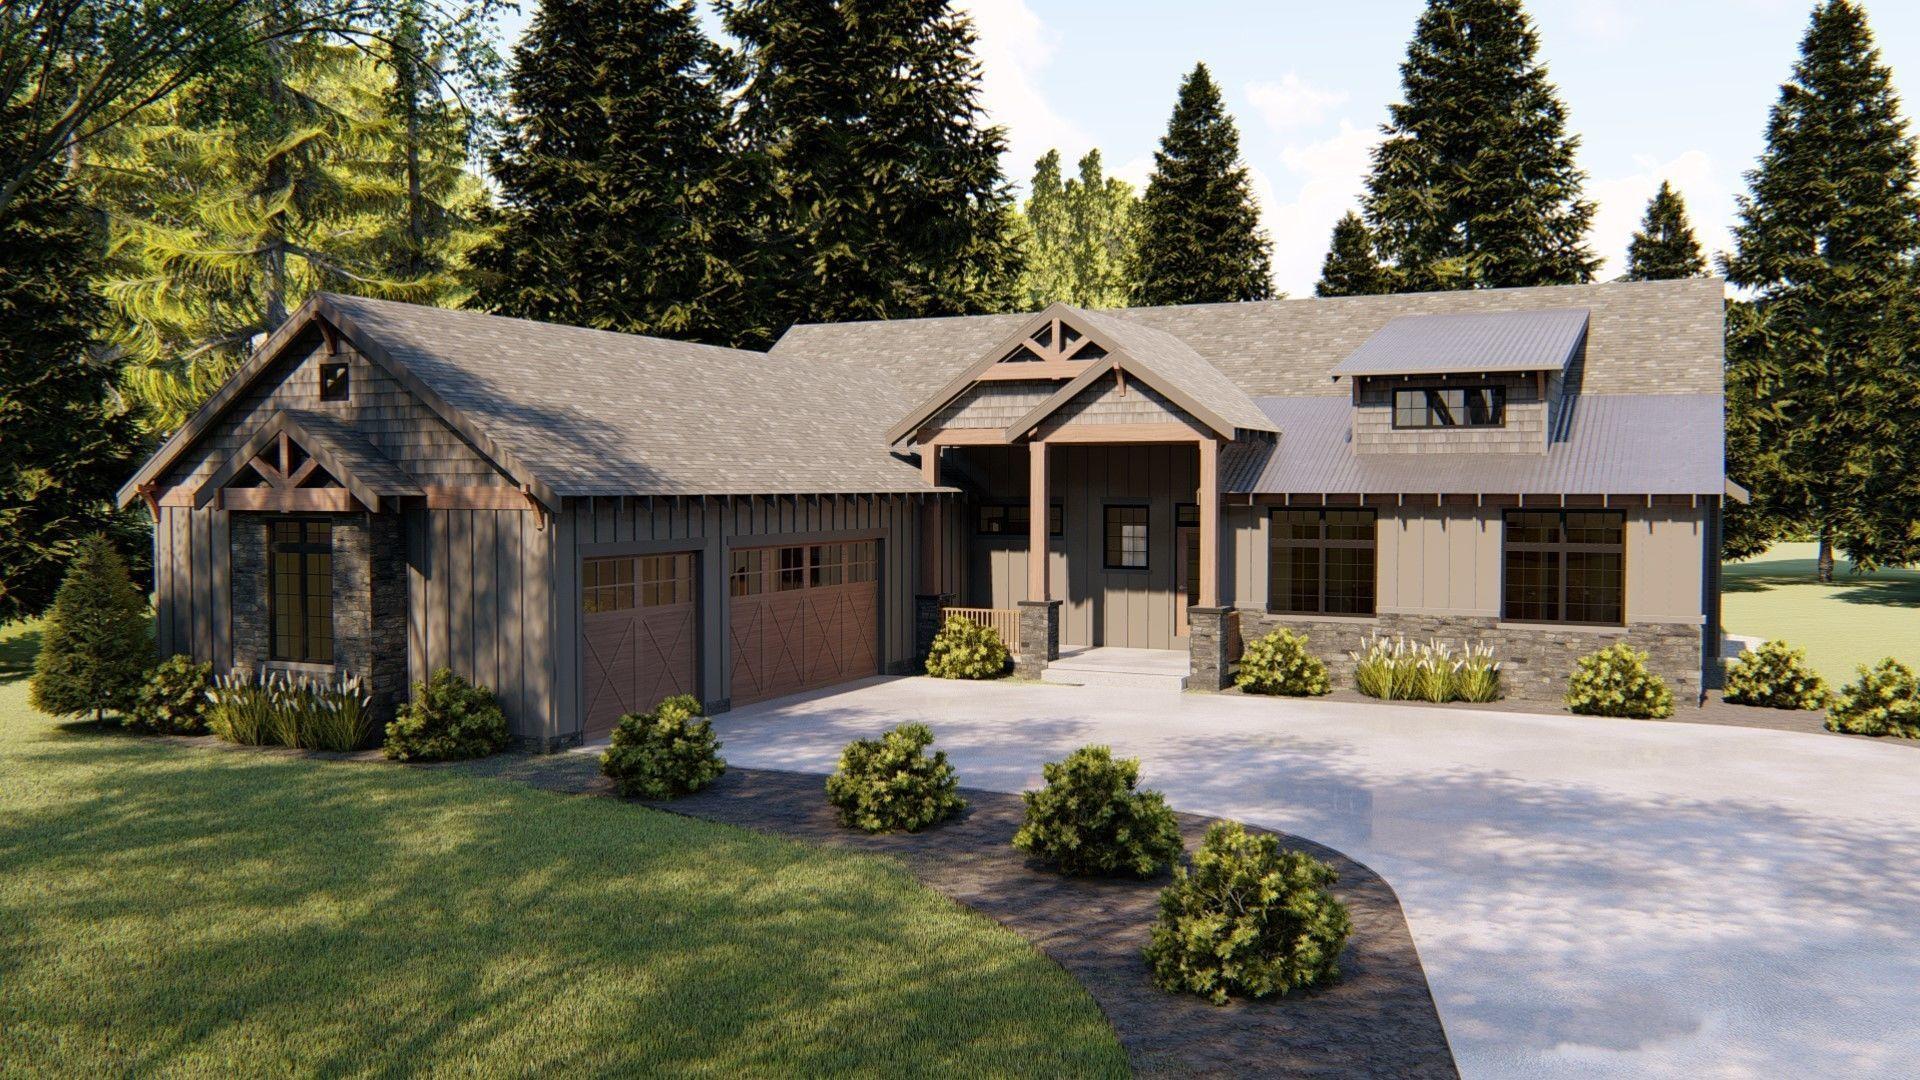 1 Story Craftsman Plan Ozark Craftsman House Craftsman House Plans Mountain House Plans